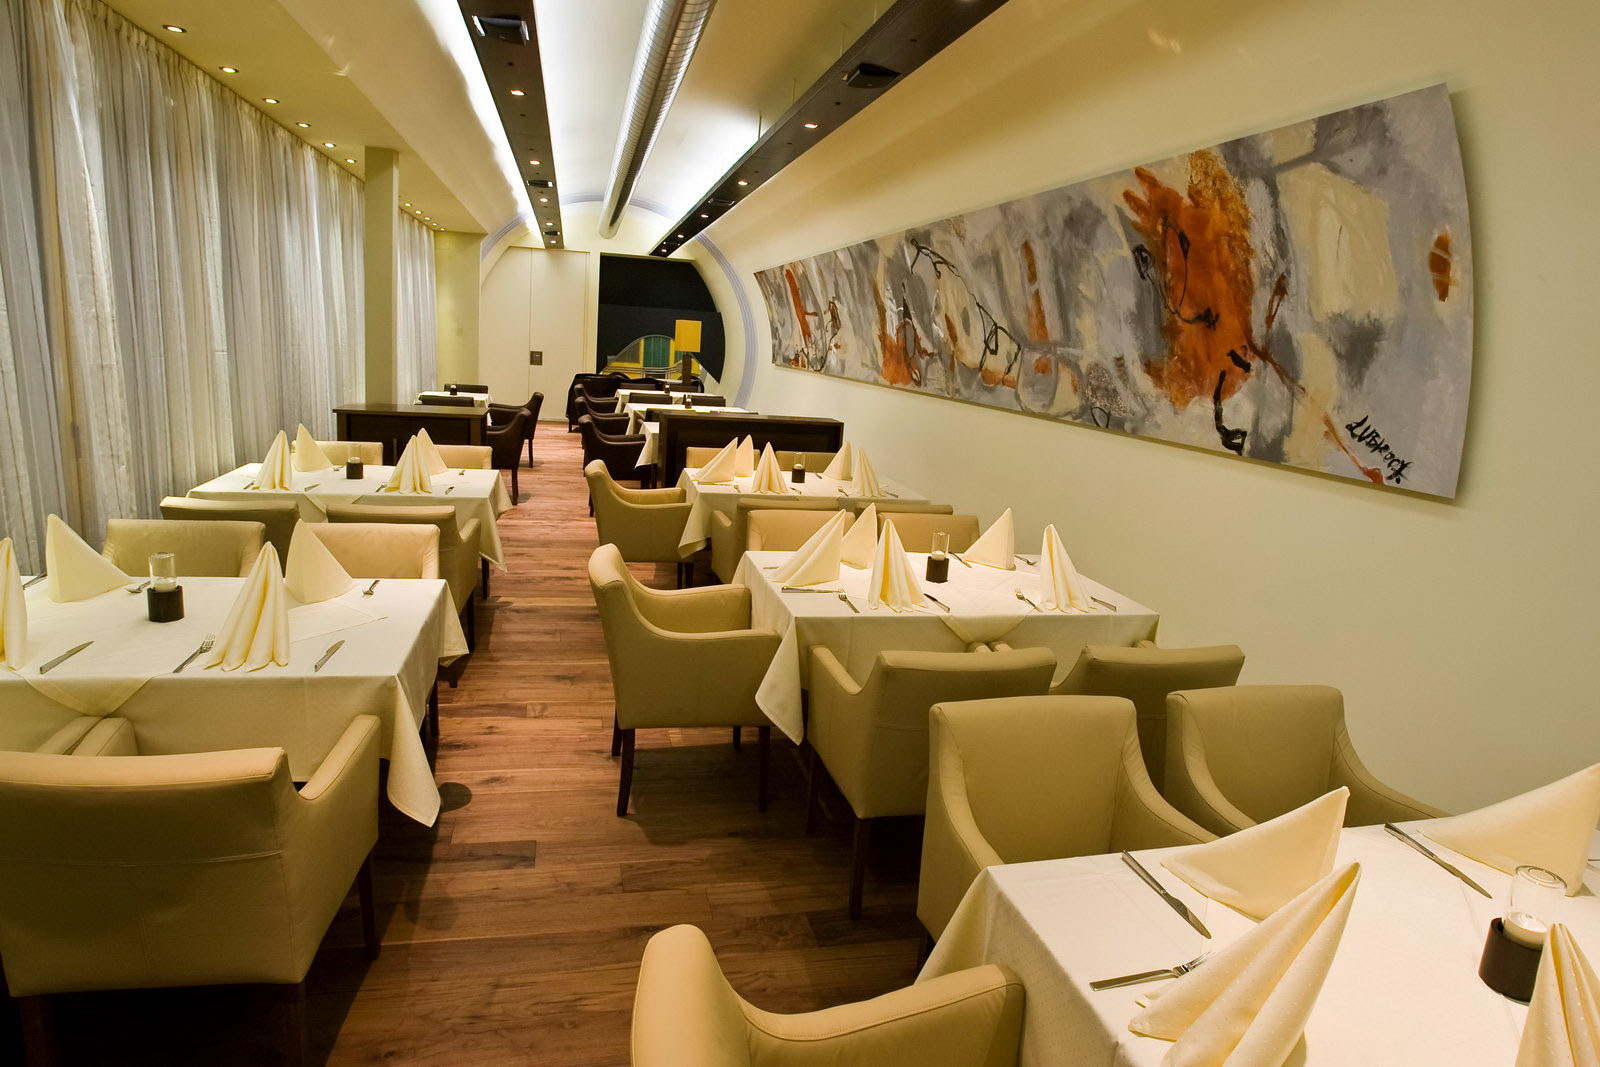 Vw Beetle Restaurant And Bar In Austria Idesignarch